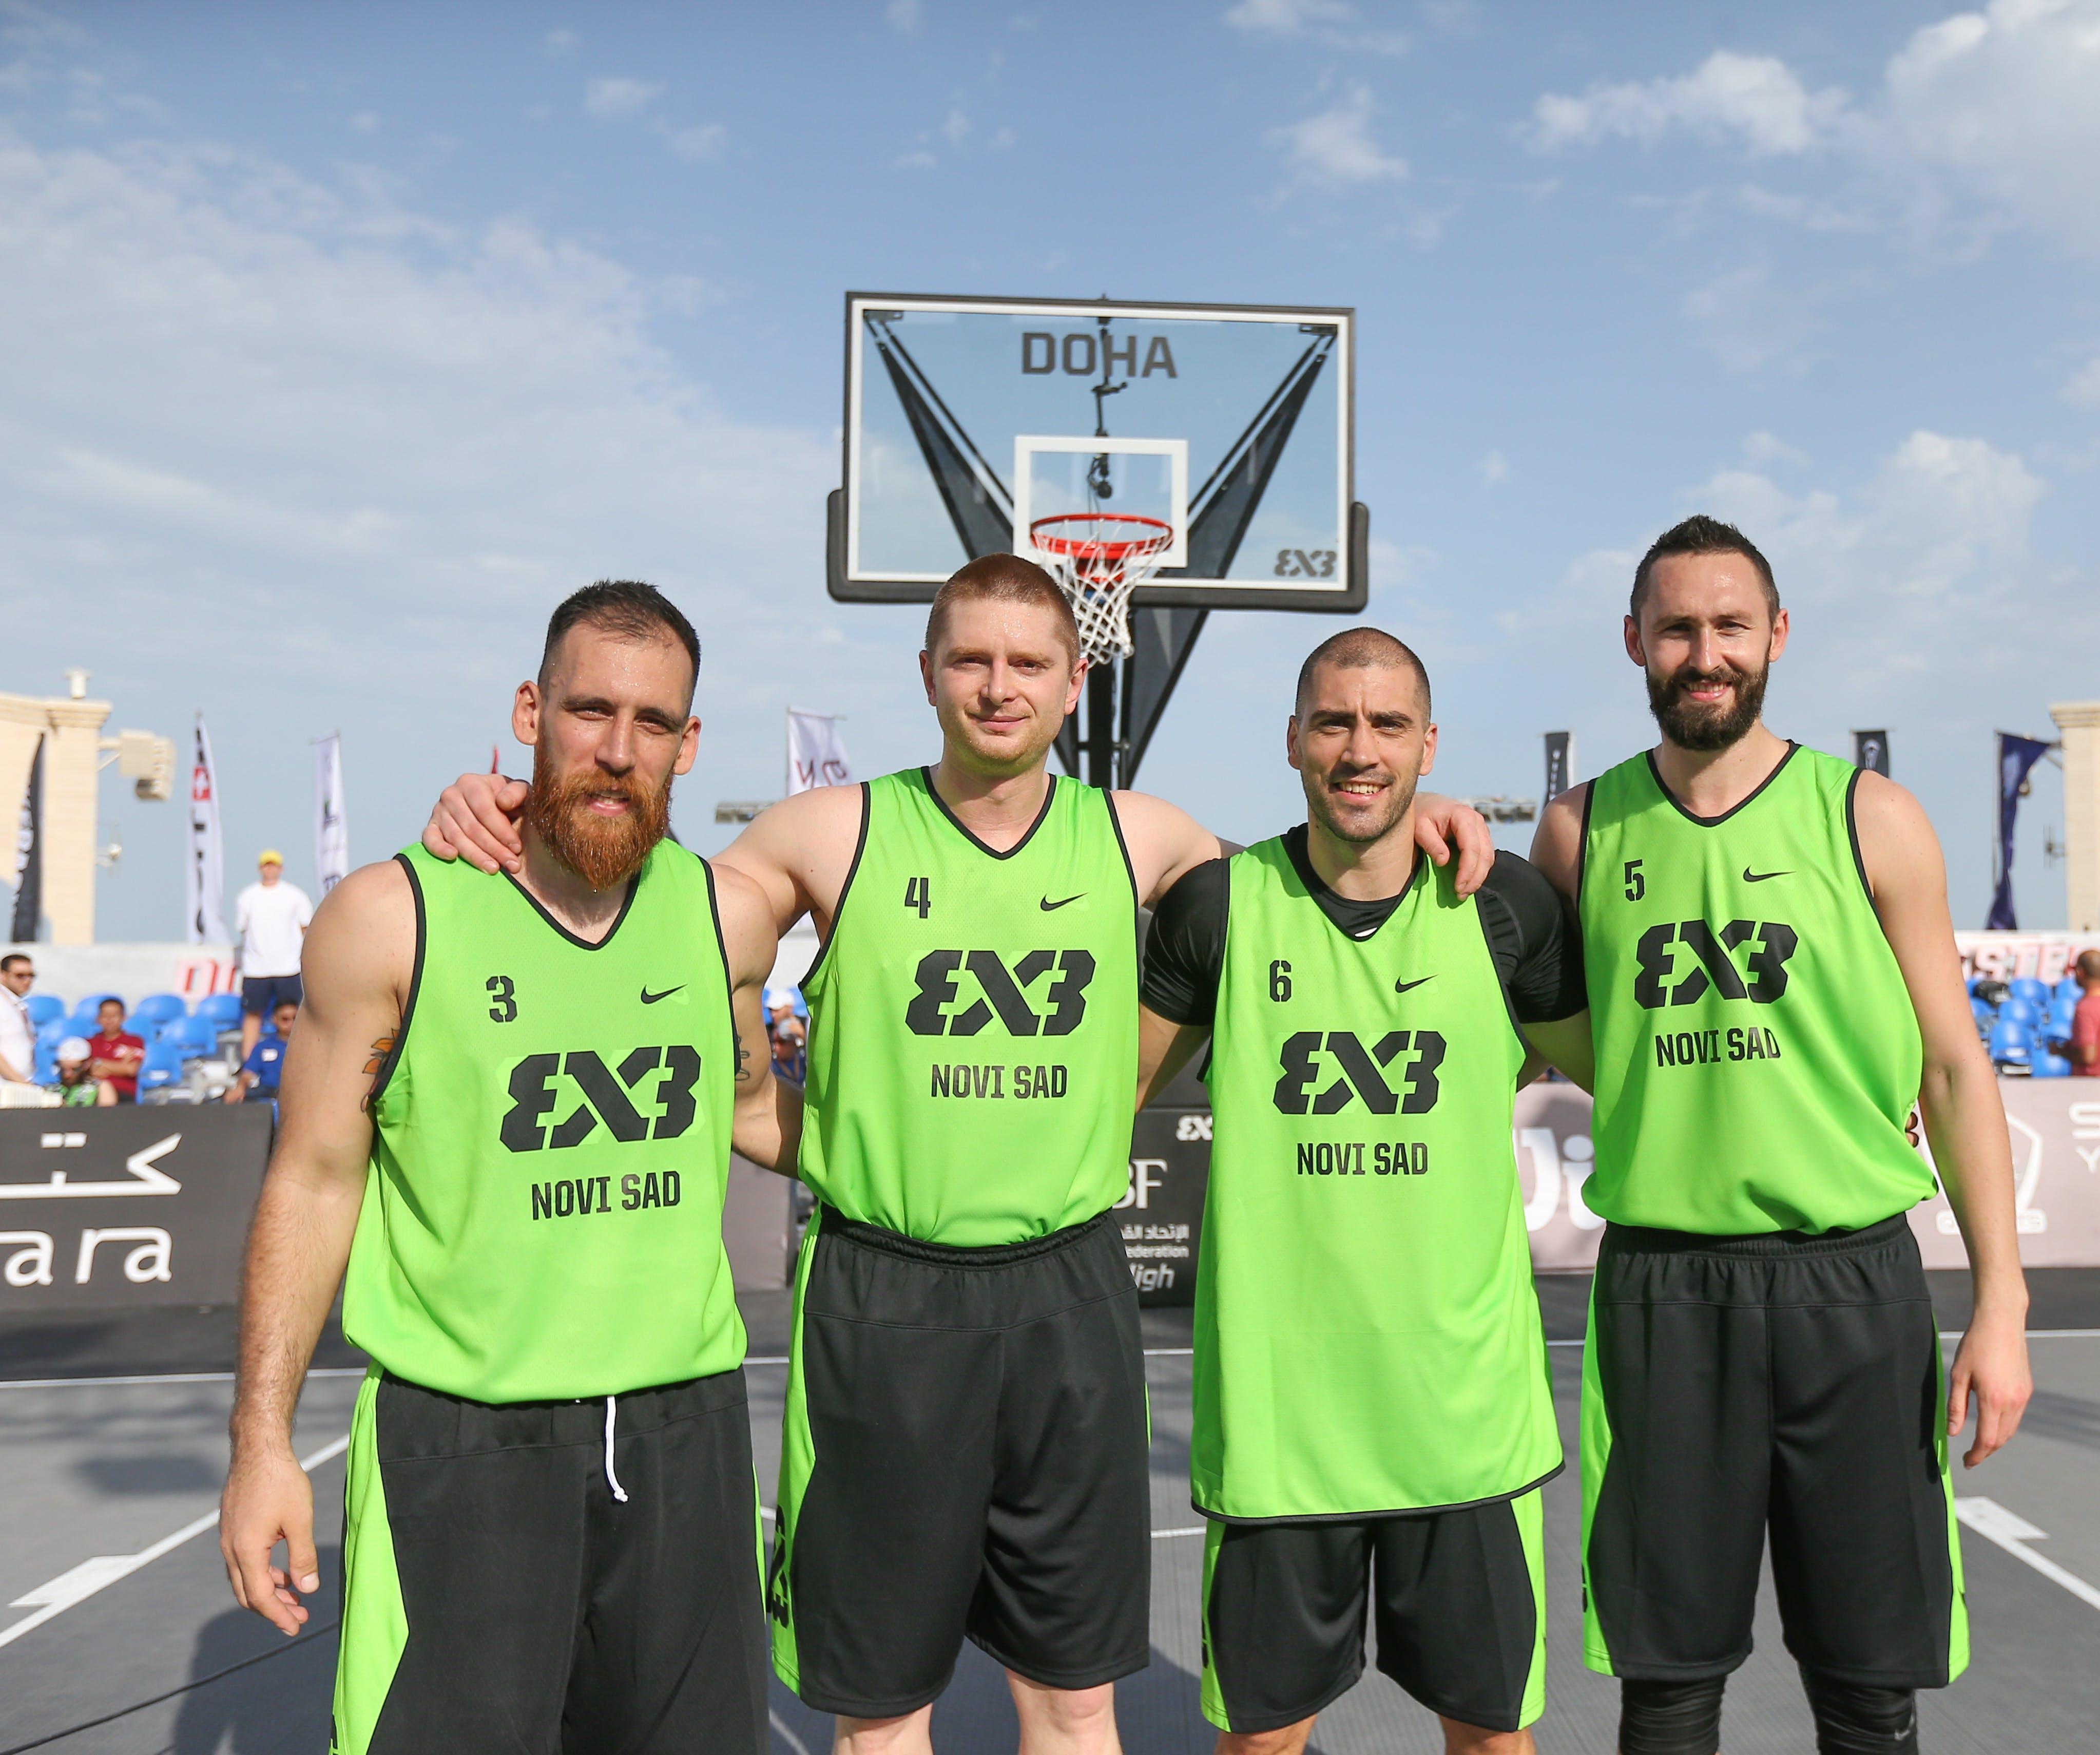 6 Dusan Bulut (SRB) - 5 Dejan Majstorovic (SRB) - 4 Marko Savić (SRB) - 3 Marko Zdero (SRB)